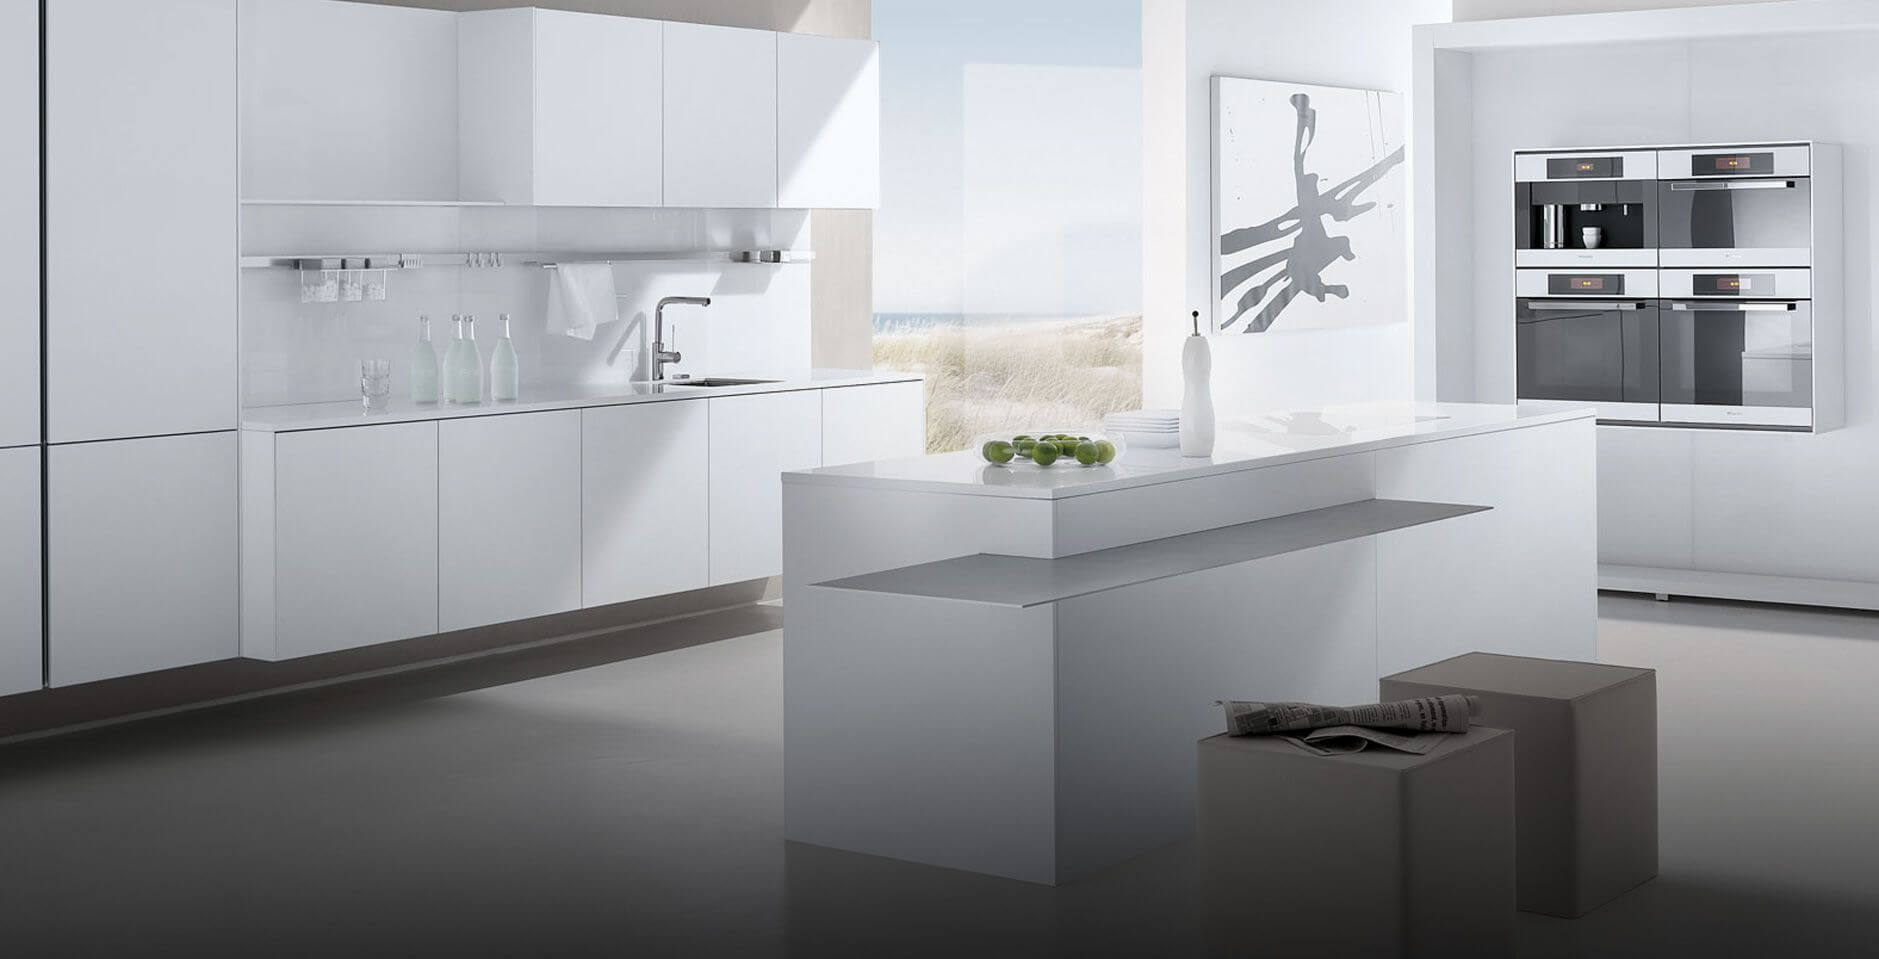 Full Size of Ikea Küche Planen Termin Küche Planen Grundriss Poco Küche Planen Küche Planen Checkliste Küche Küche Planen